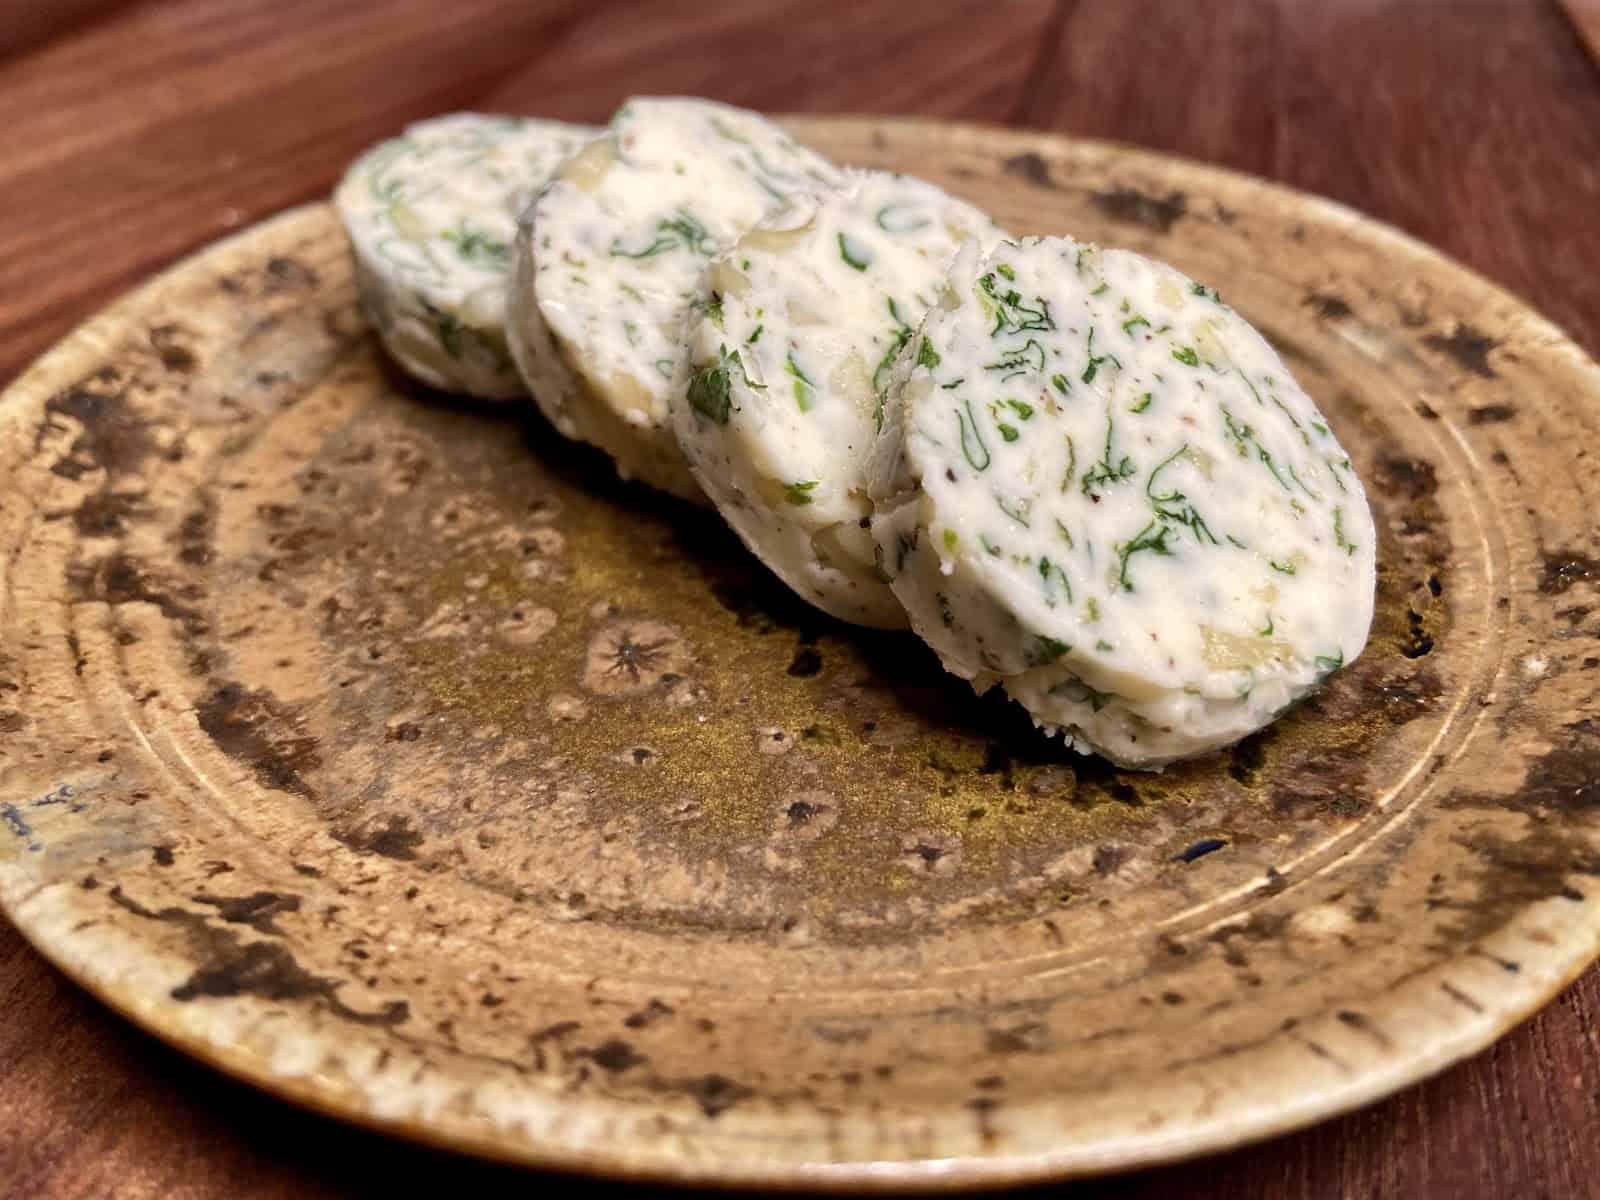 Sheet Pan Dinner - Garlic Herb Compound Butter (Photo by Erich Boenzli)